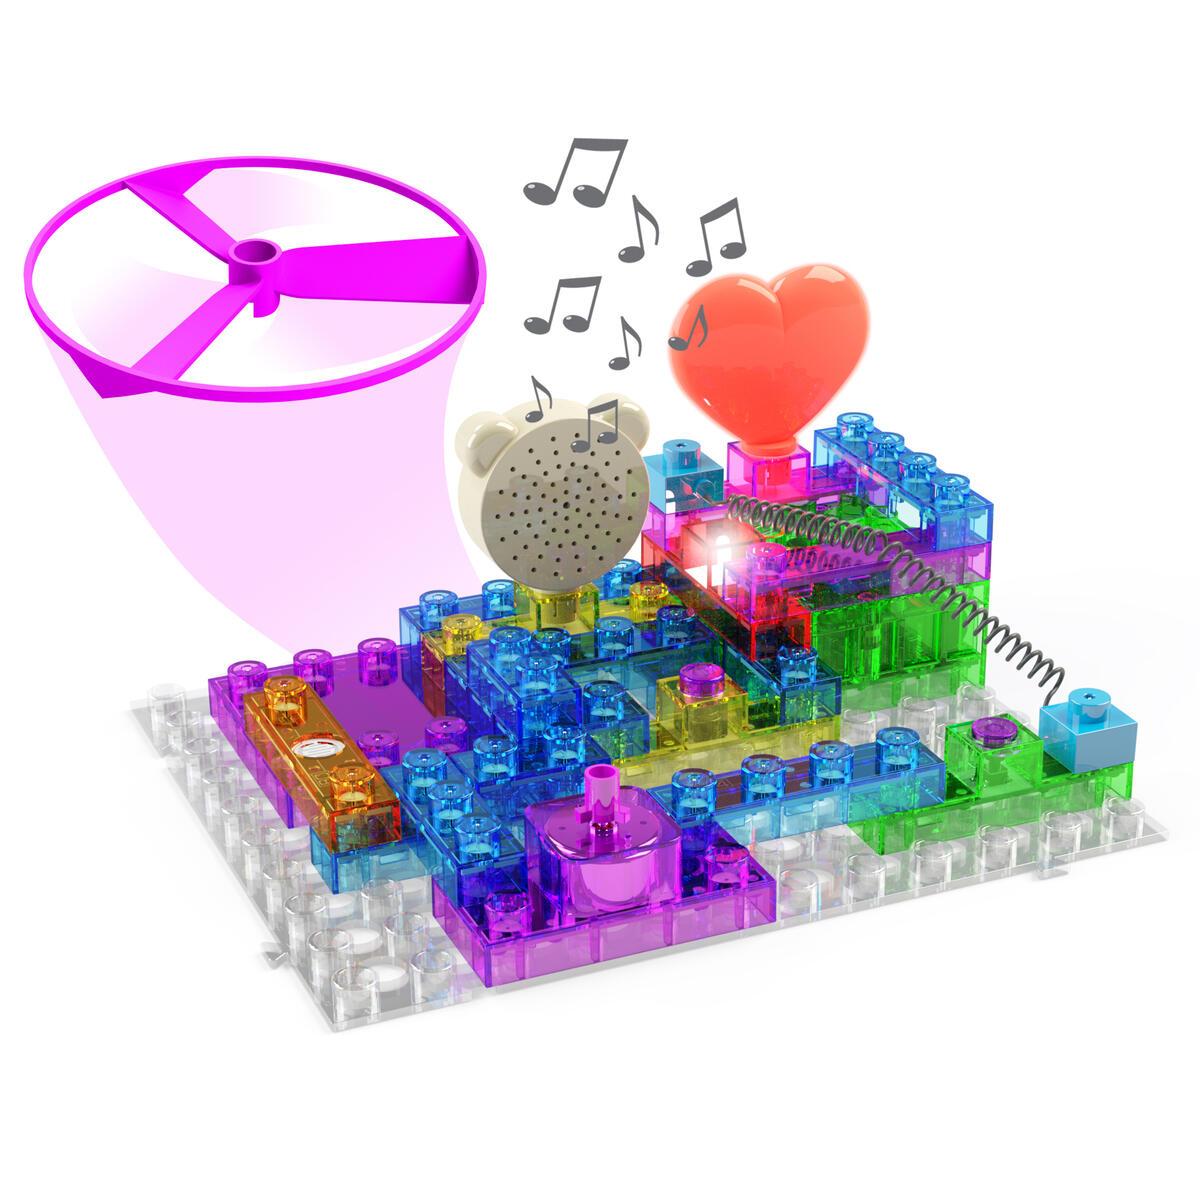 Circuit Blox 115 Project Set